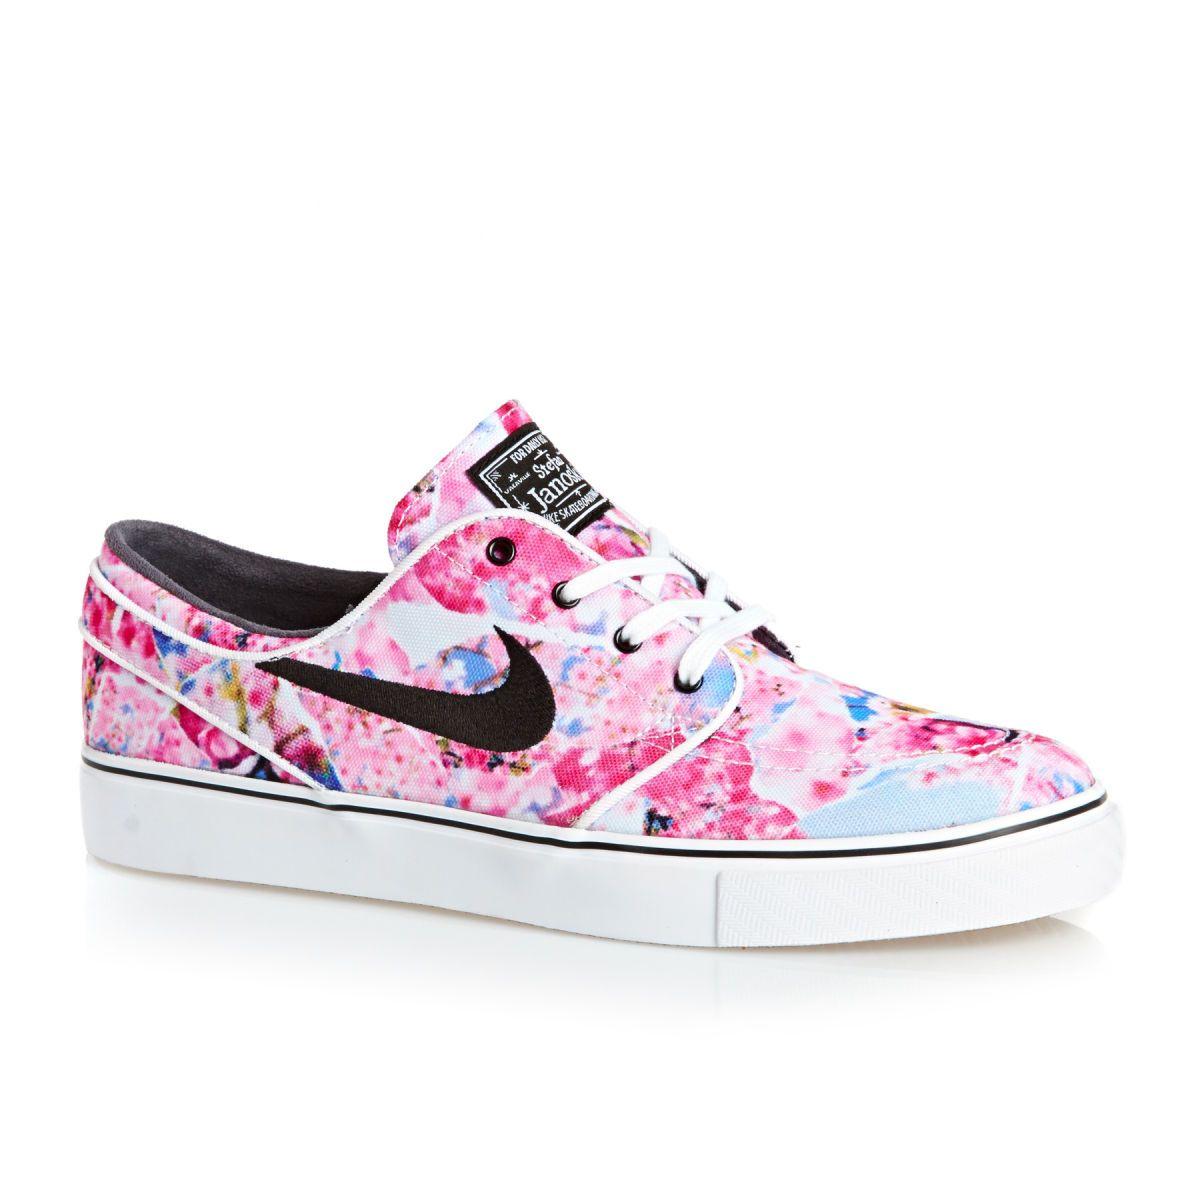 Nike Skateboarding Zoom Stefan Janoski Shoes - Dynamic Pink/black